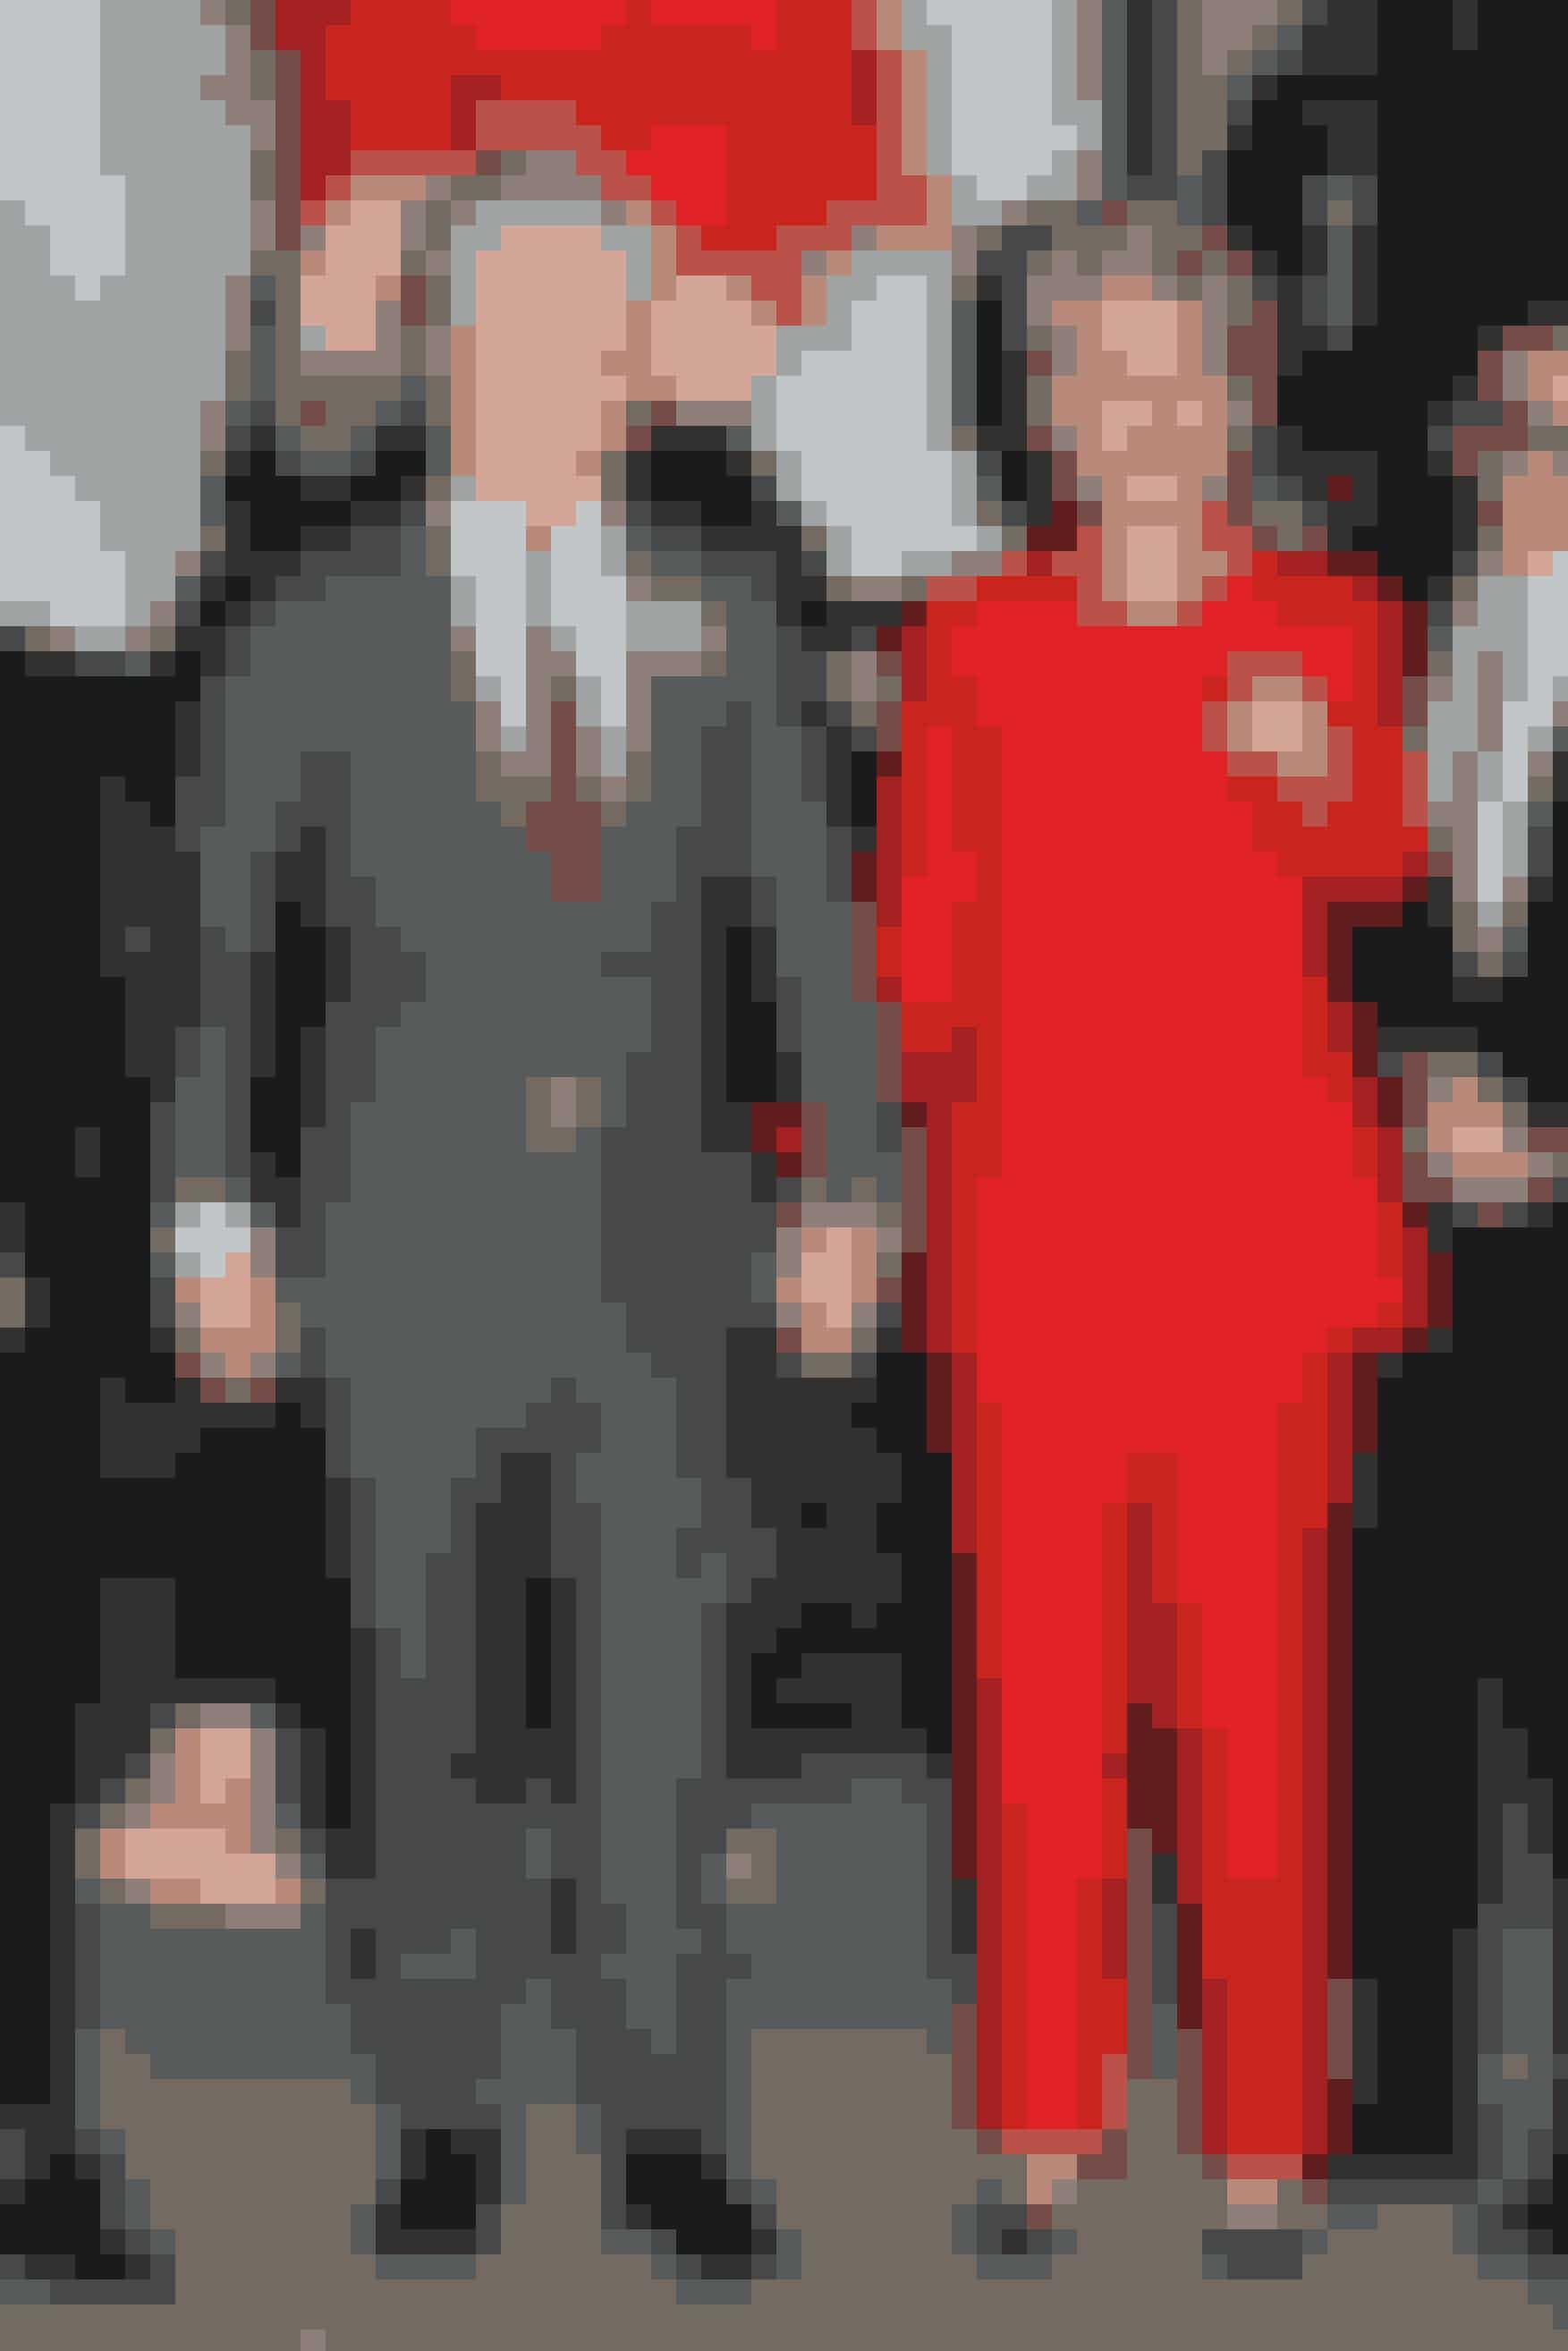 Katy Perry og Orlando Bloom som Hilary og Bill Clinton, 2016